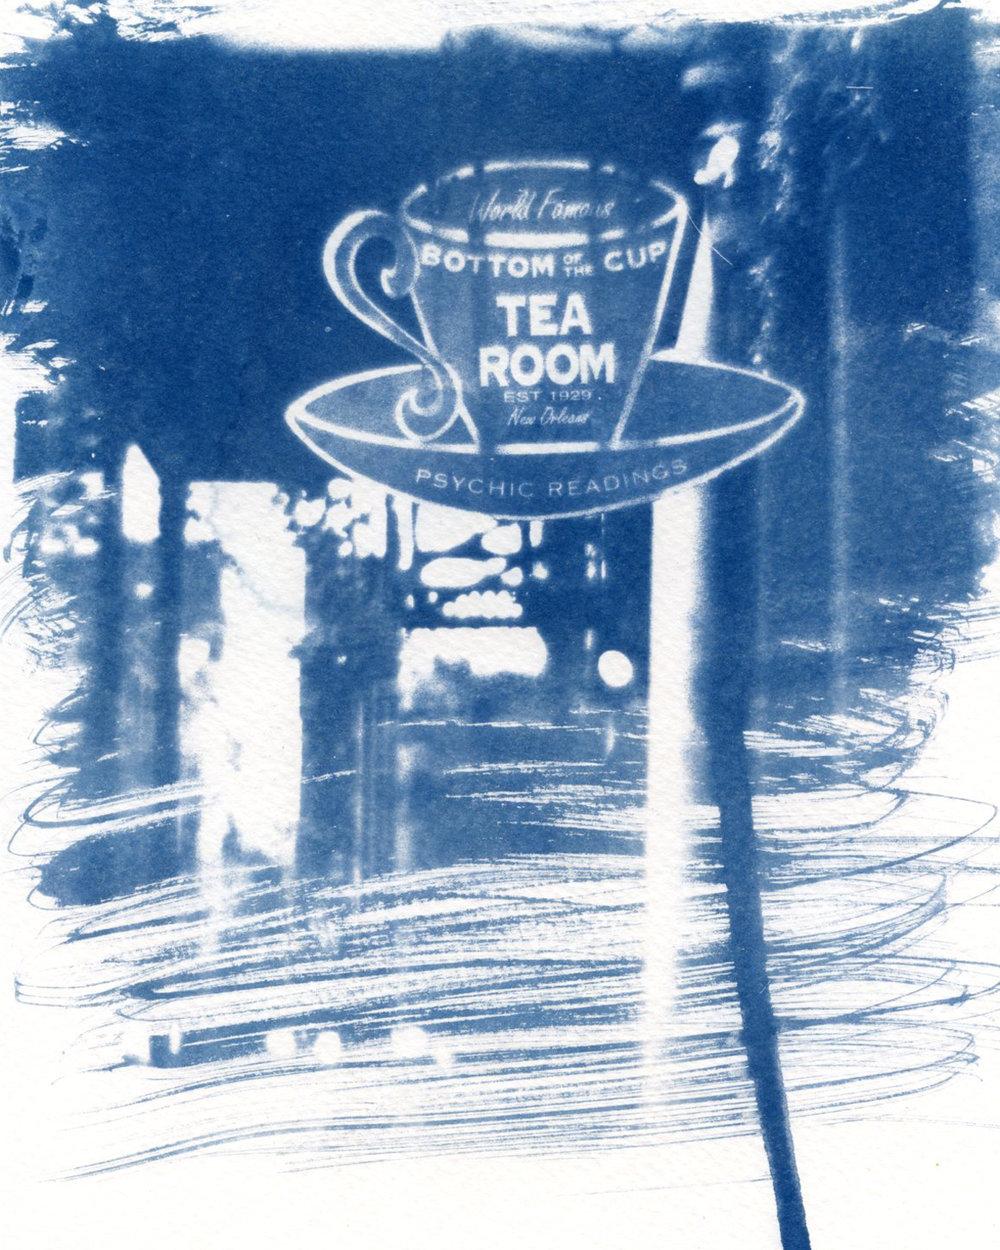 cyanotypes-006.jpg